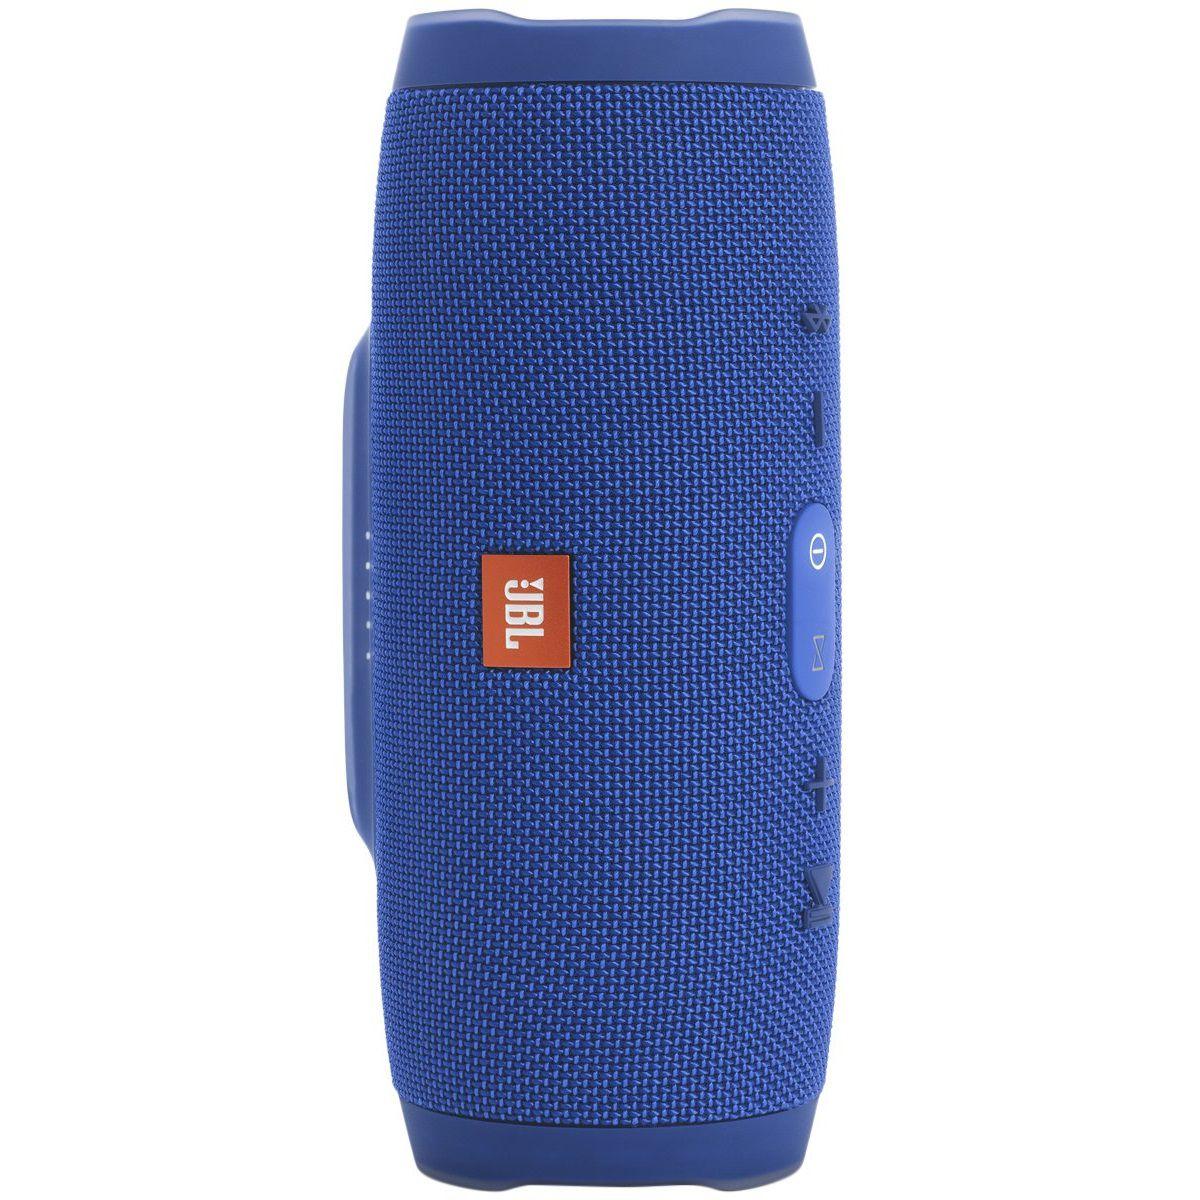 Caixa De Som Jbl Charge 3 Blue Portátil Bluetooth